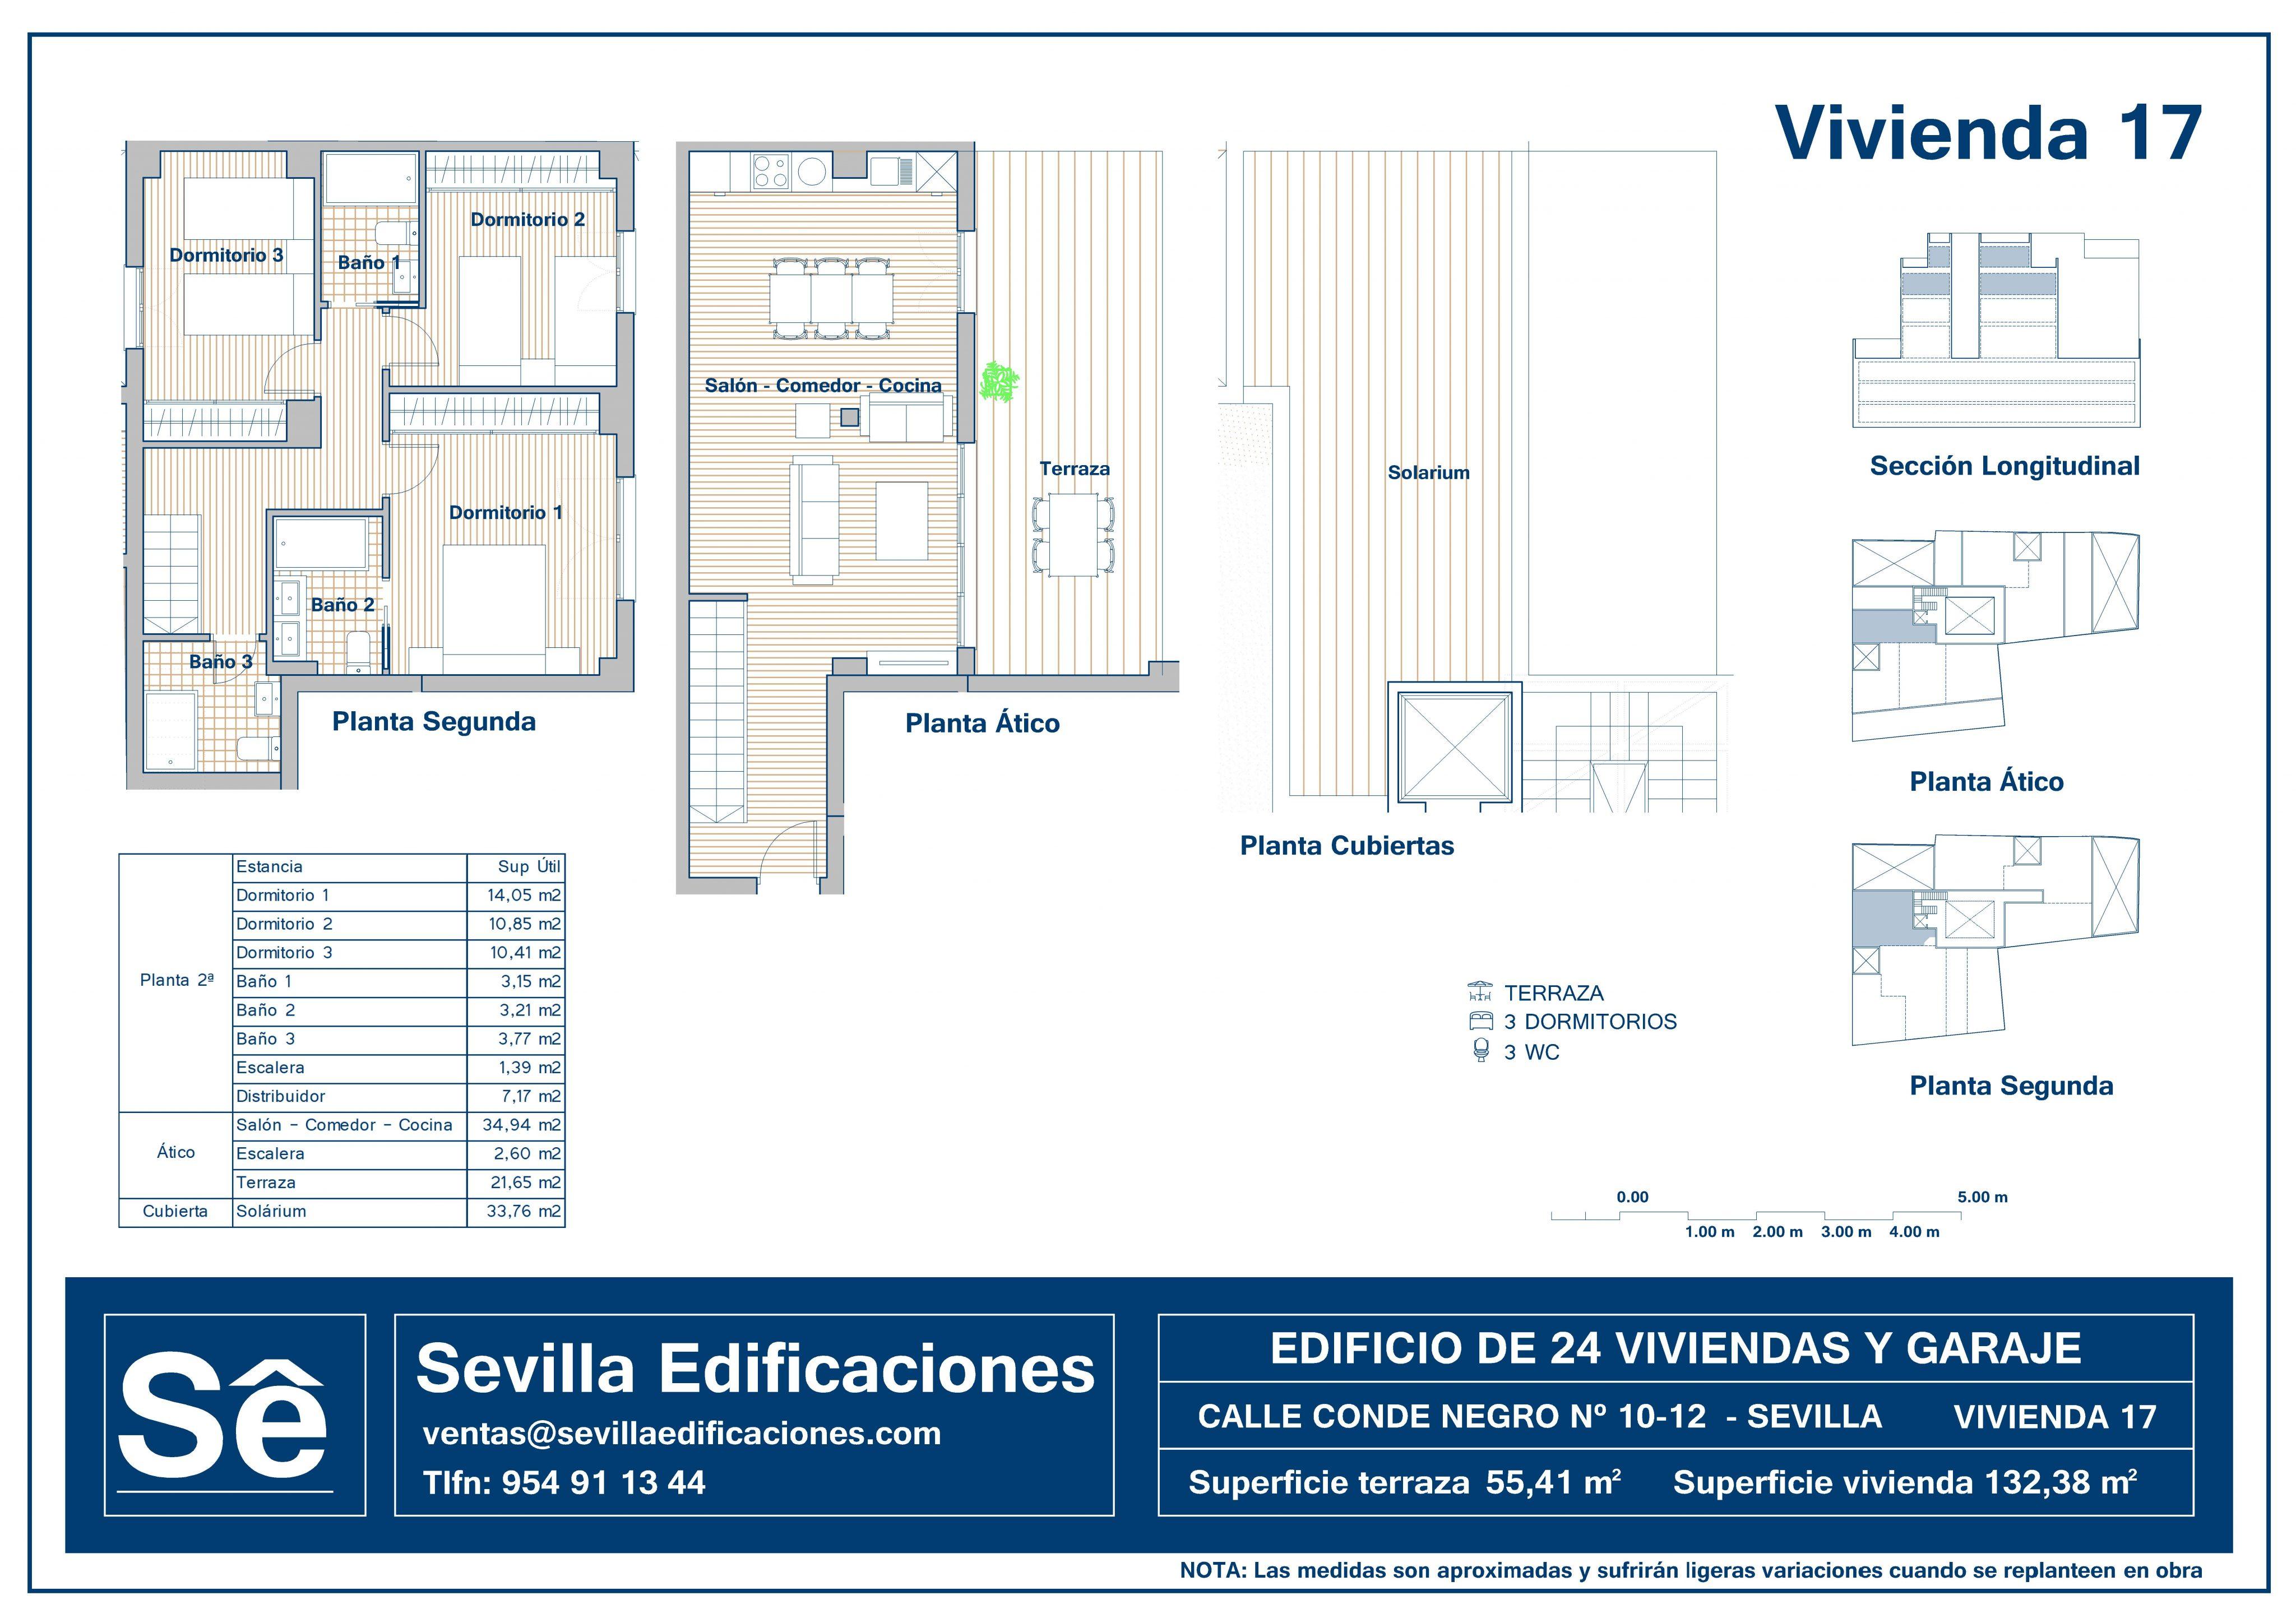 CONDENEGRO_VIVIENDA_17